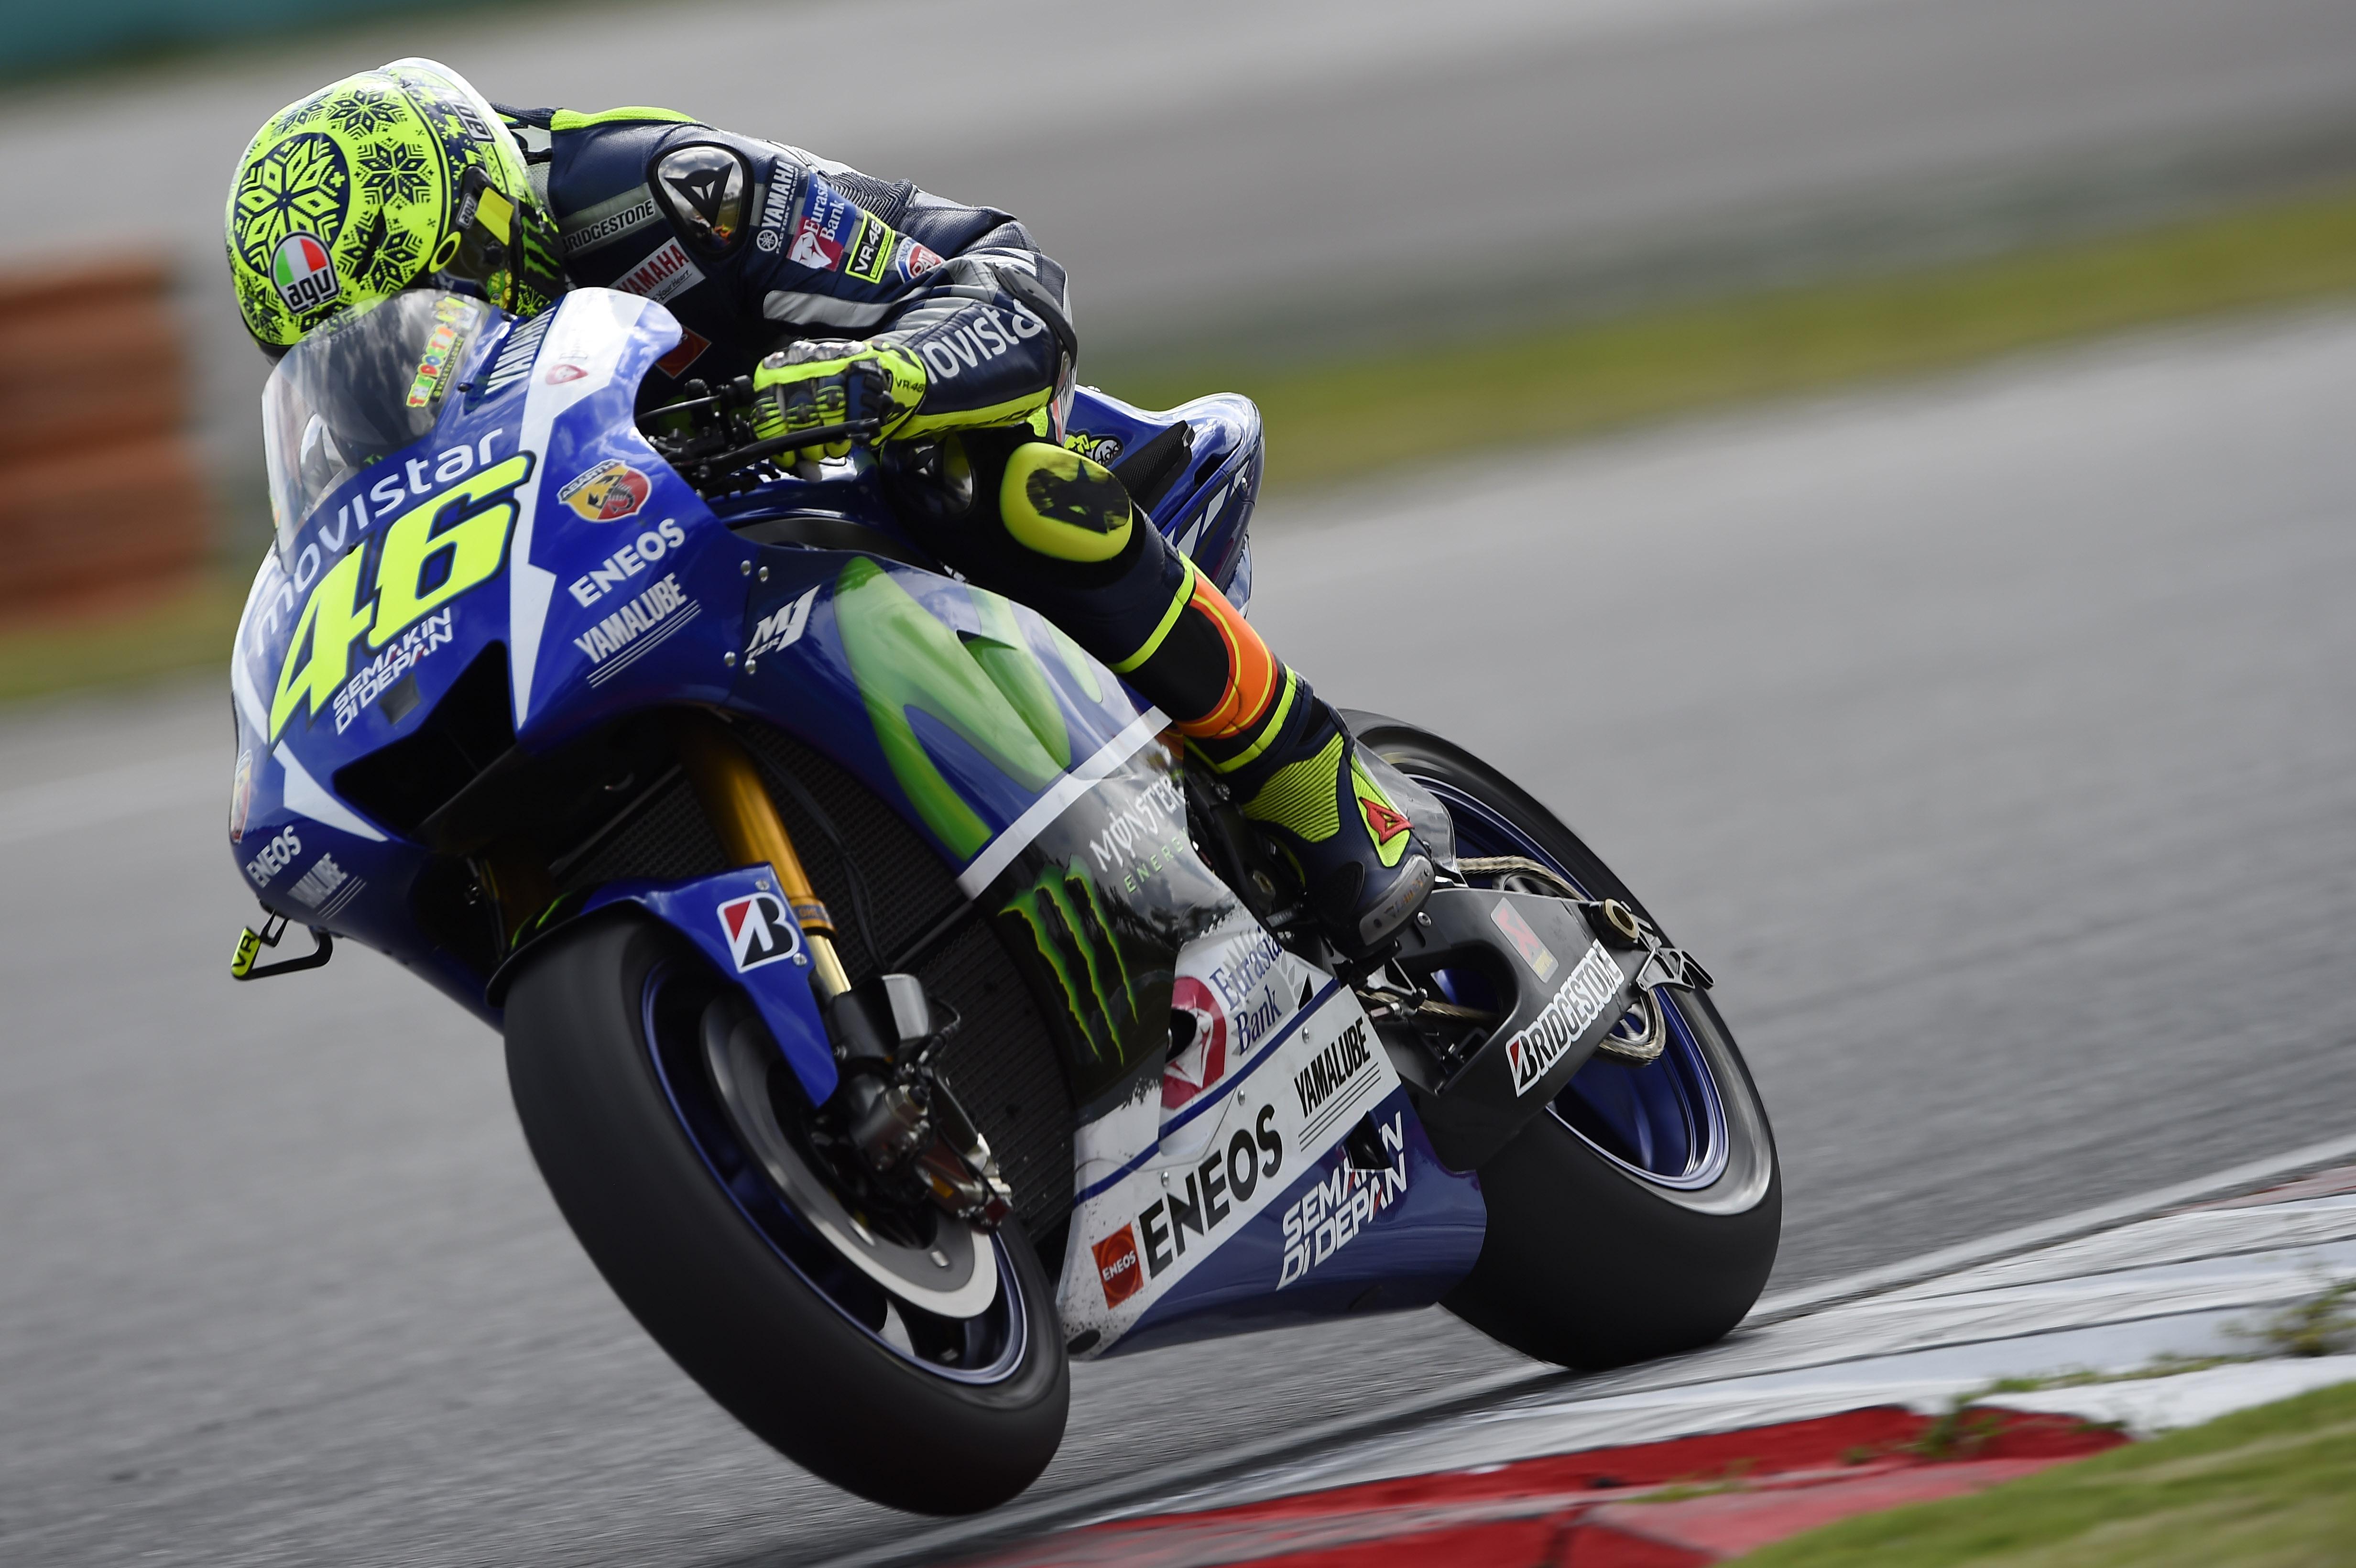 Valentino Rossi Race MotoGP 2015 Wallpaper HD 6710 Wallpaper 4928x3280